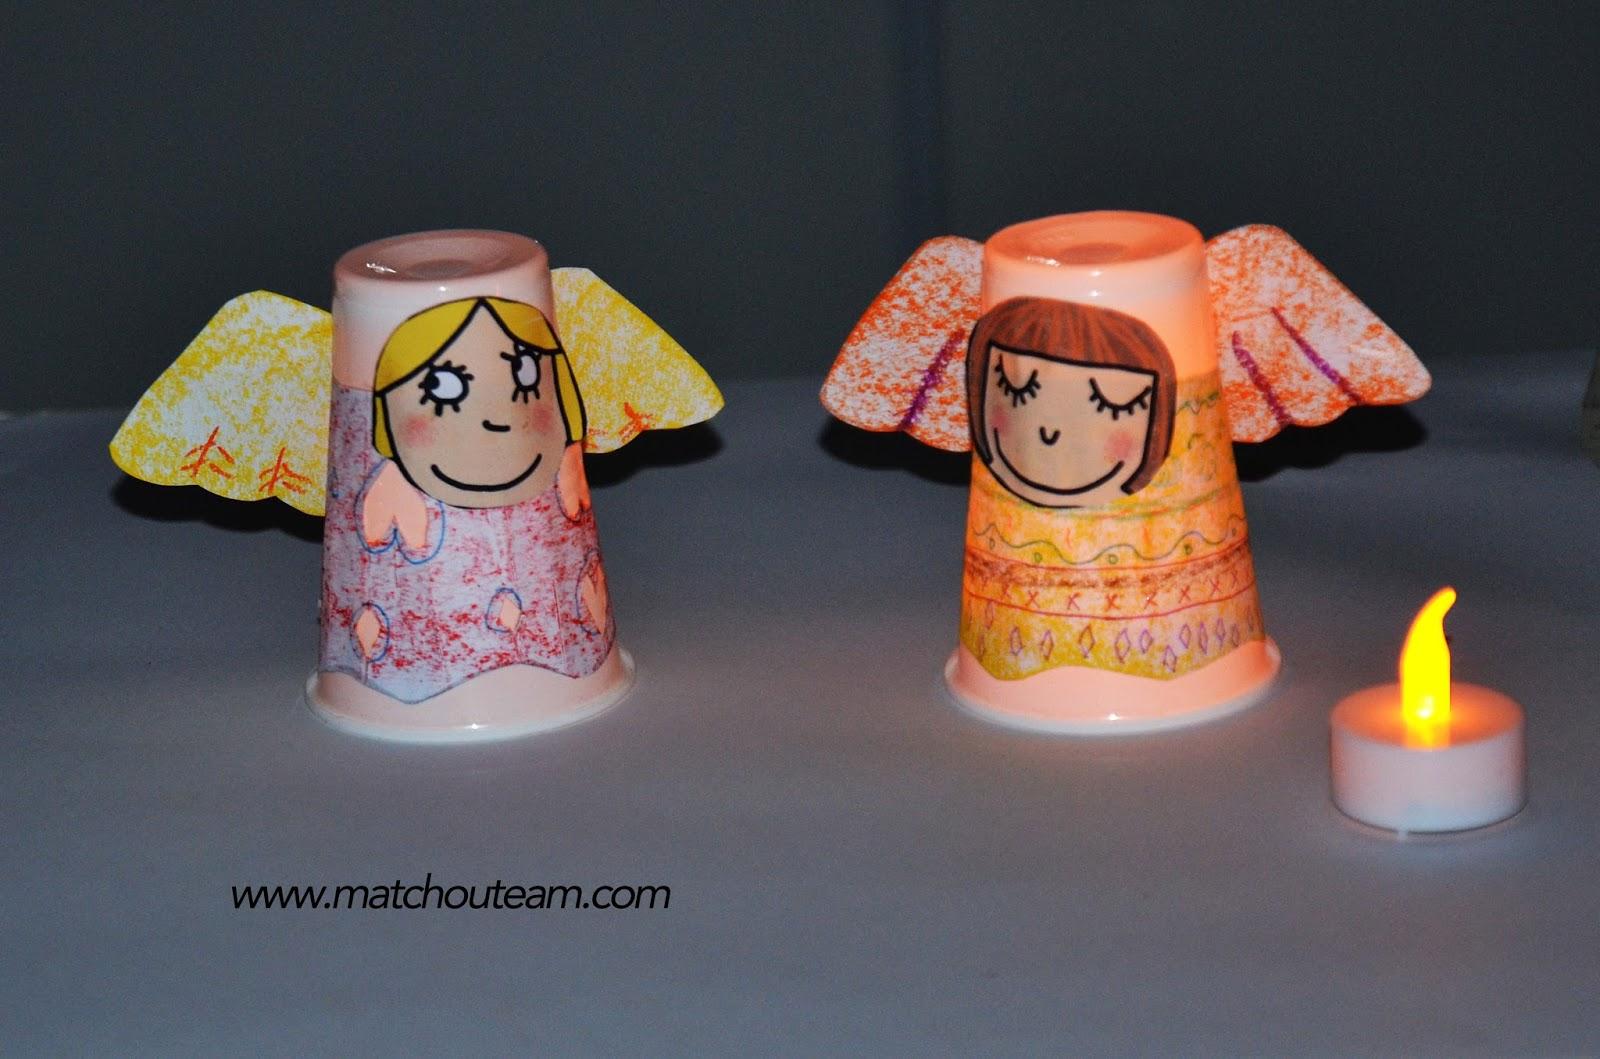 lampion pour Noël